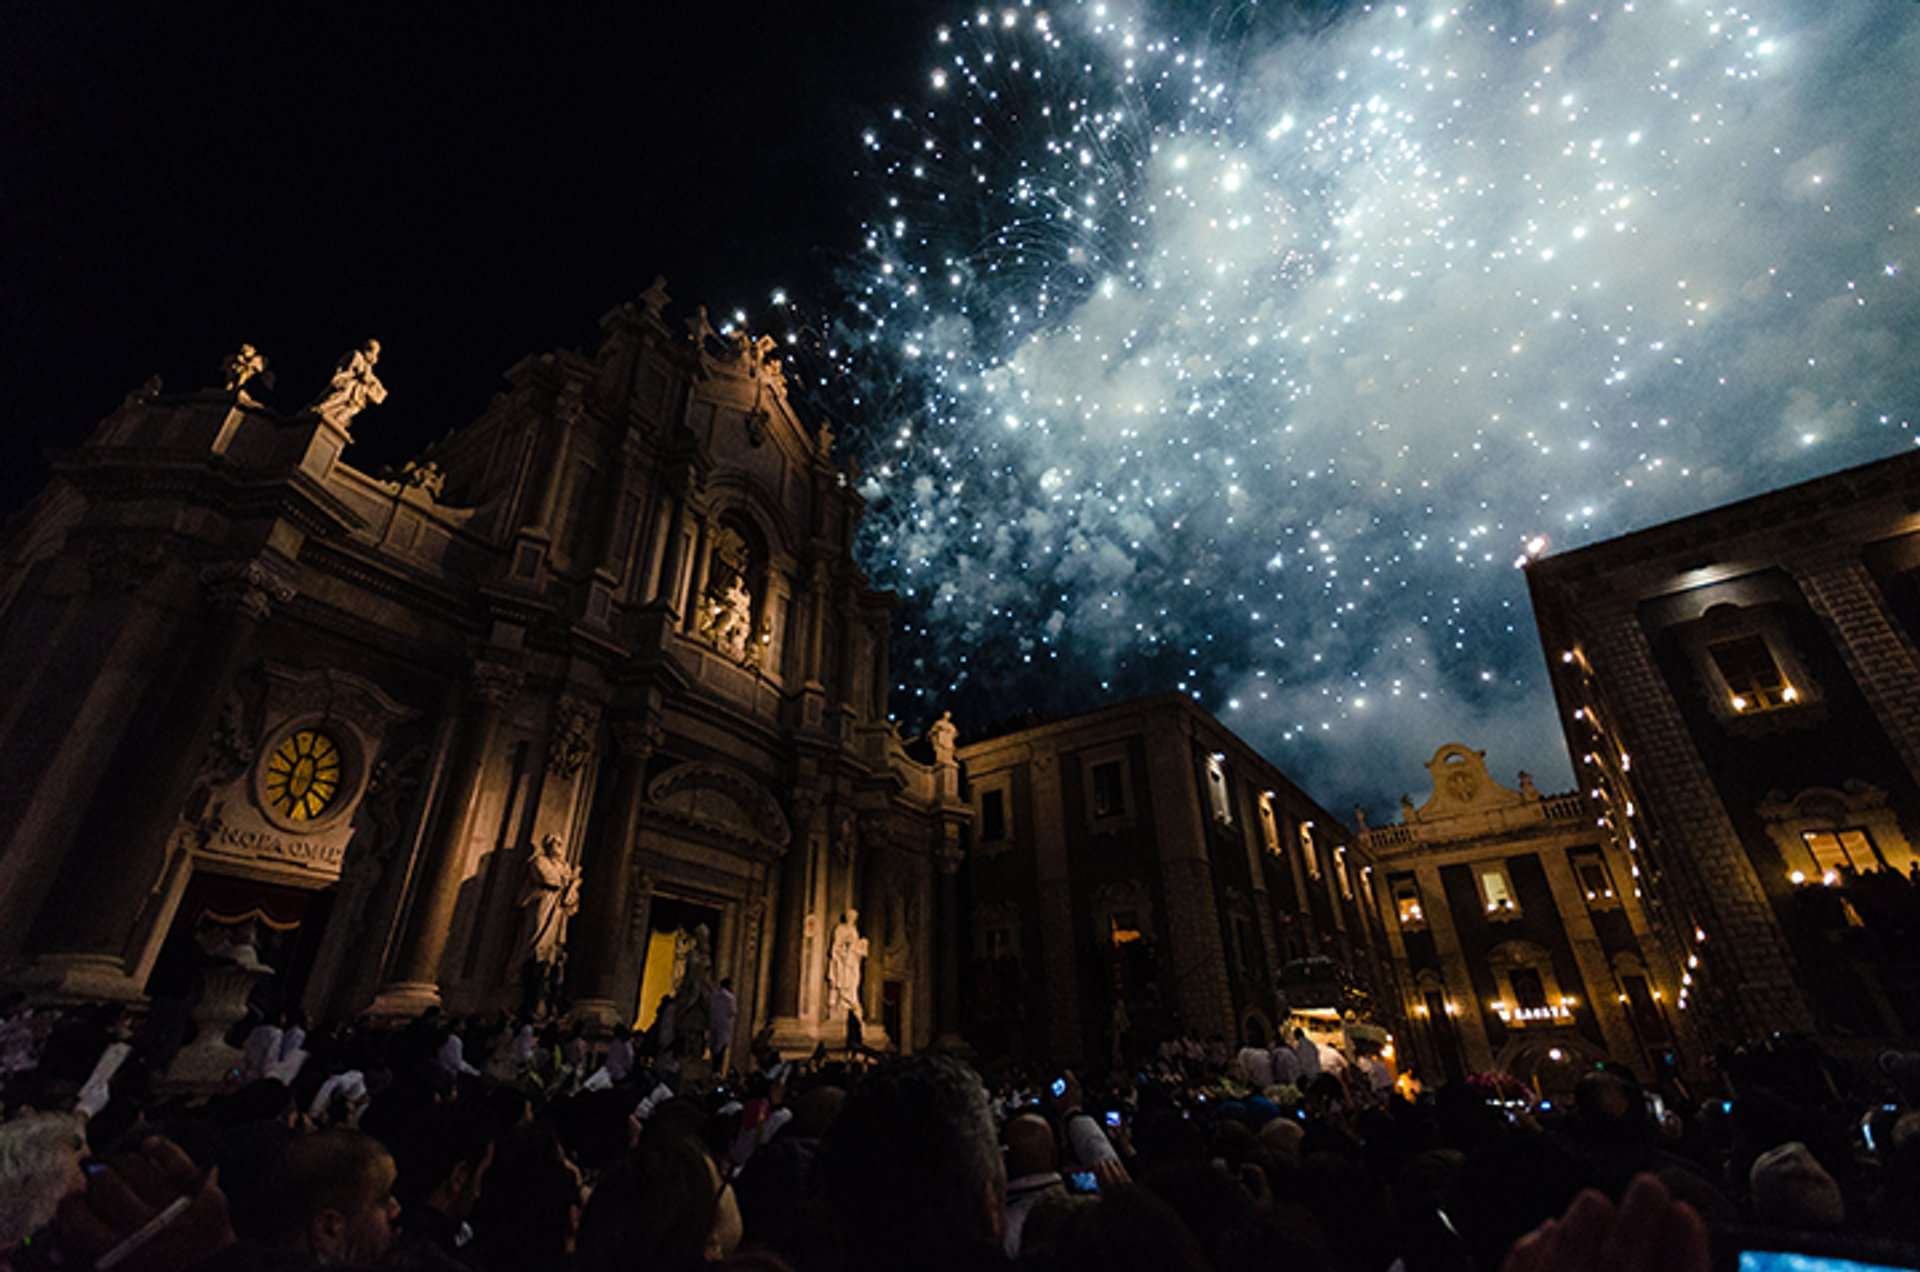 Saint Agata Festival in Sicily - Best Season 2019